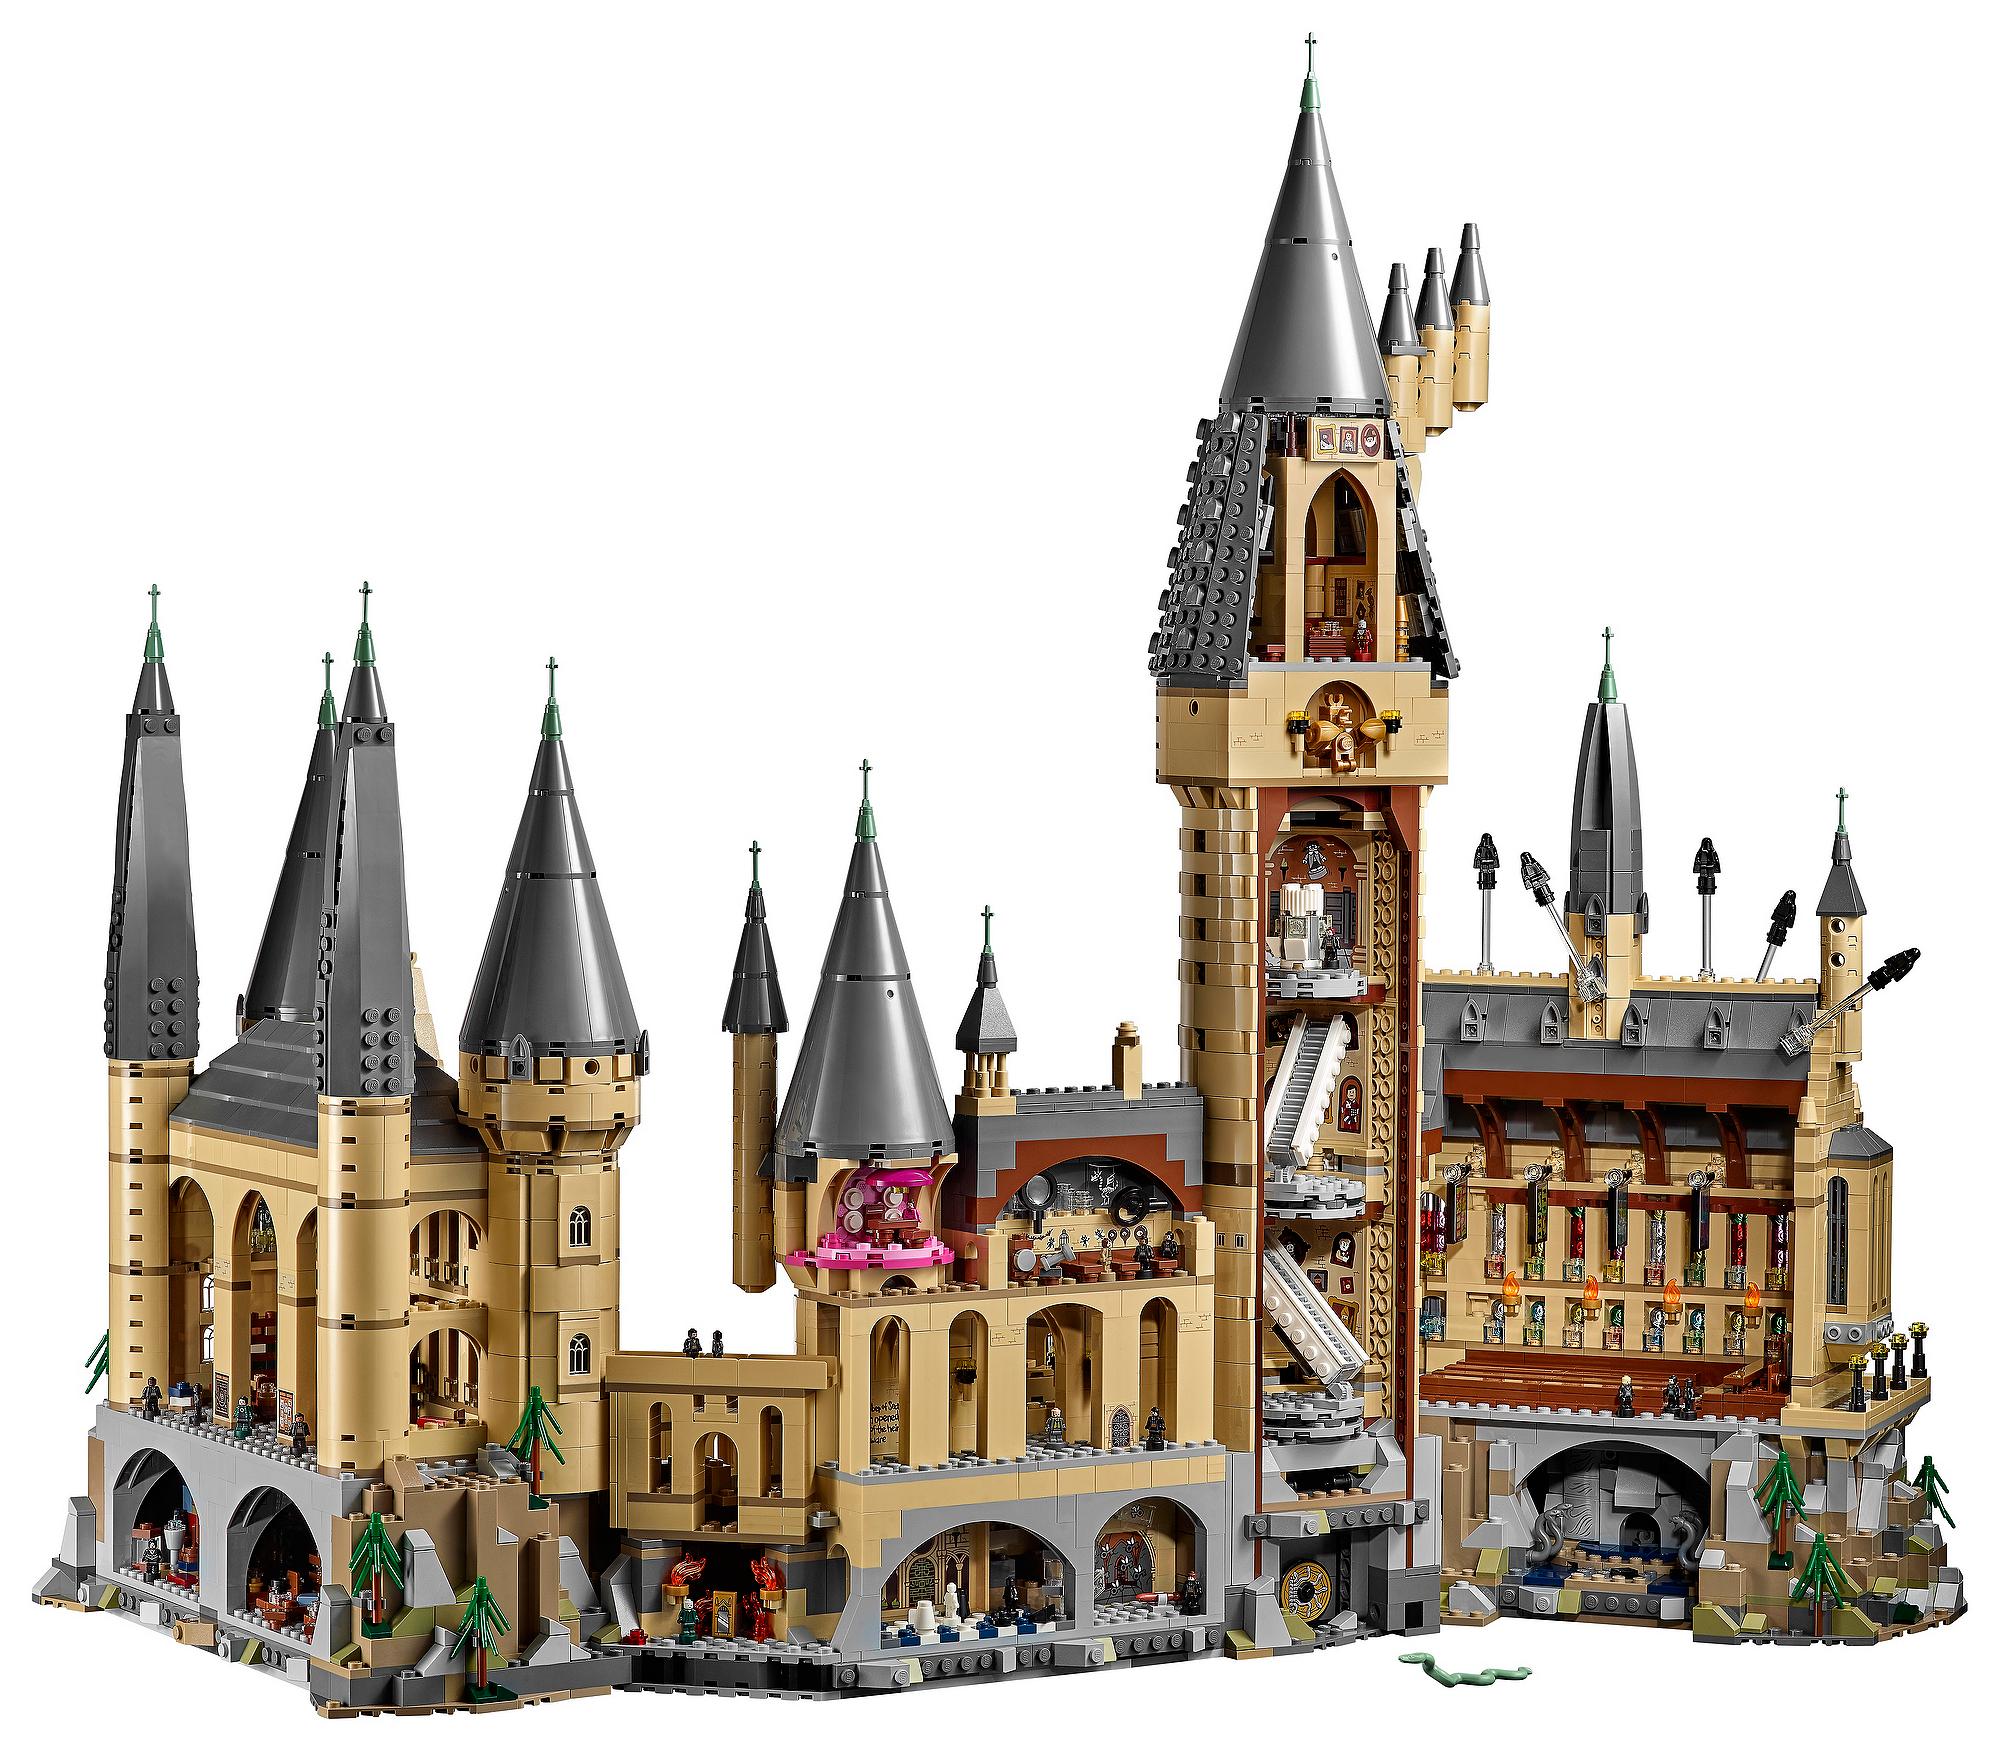 Spellbound by the massive LEGO 71043 Hogwarts Castle set ...